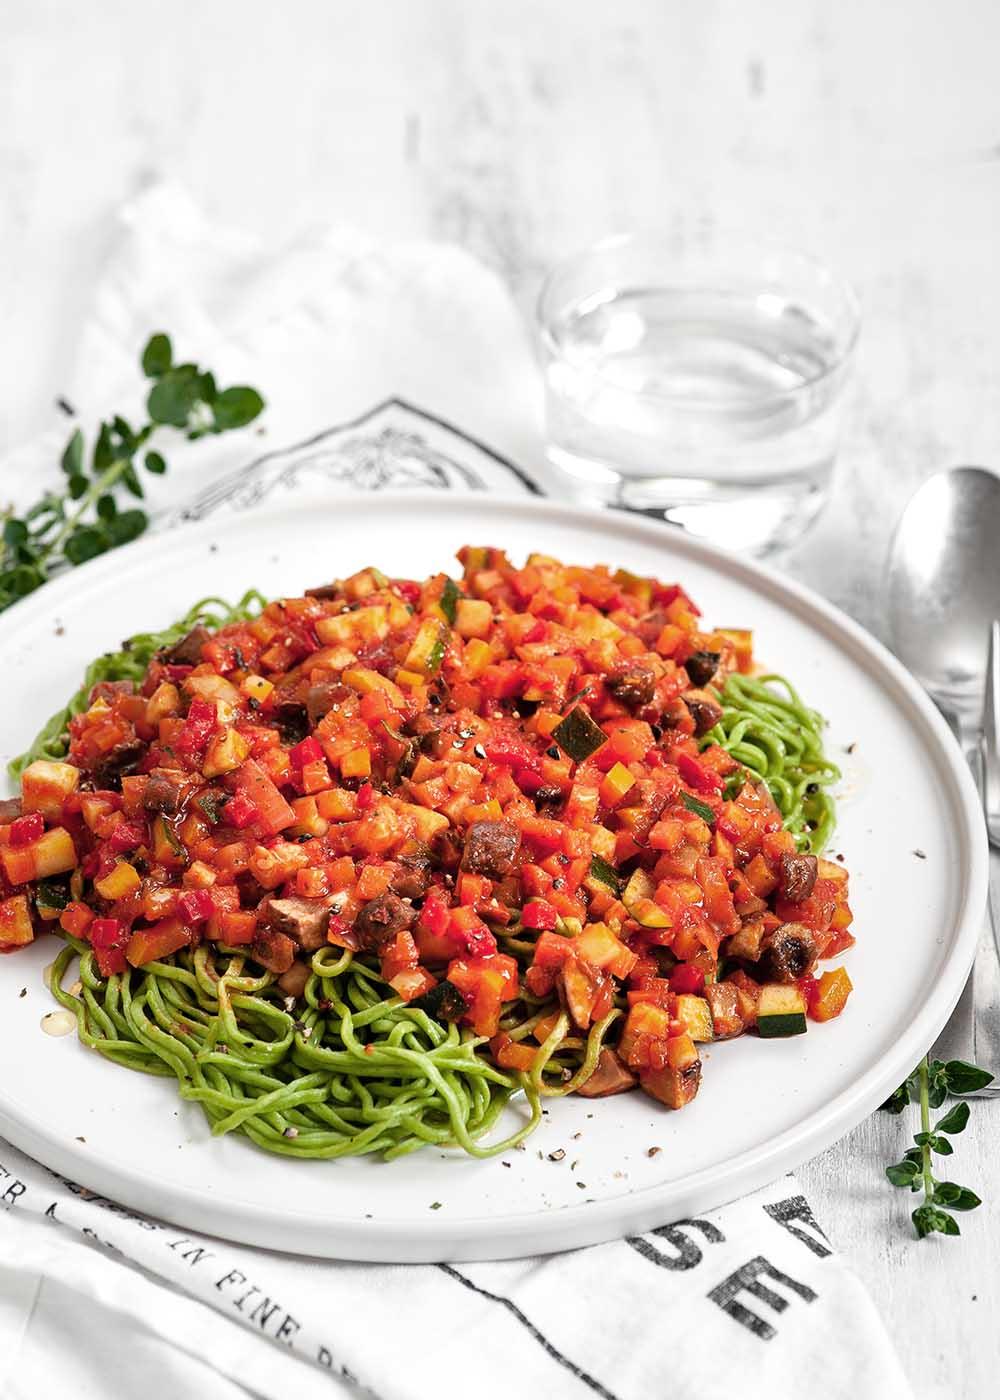 Grüne Spinat-Spaghetti mit Gemüse-Bolognese 2